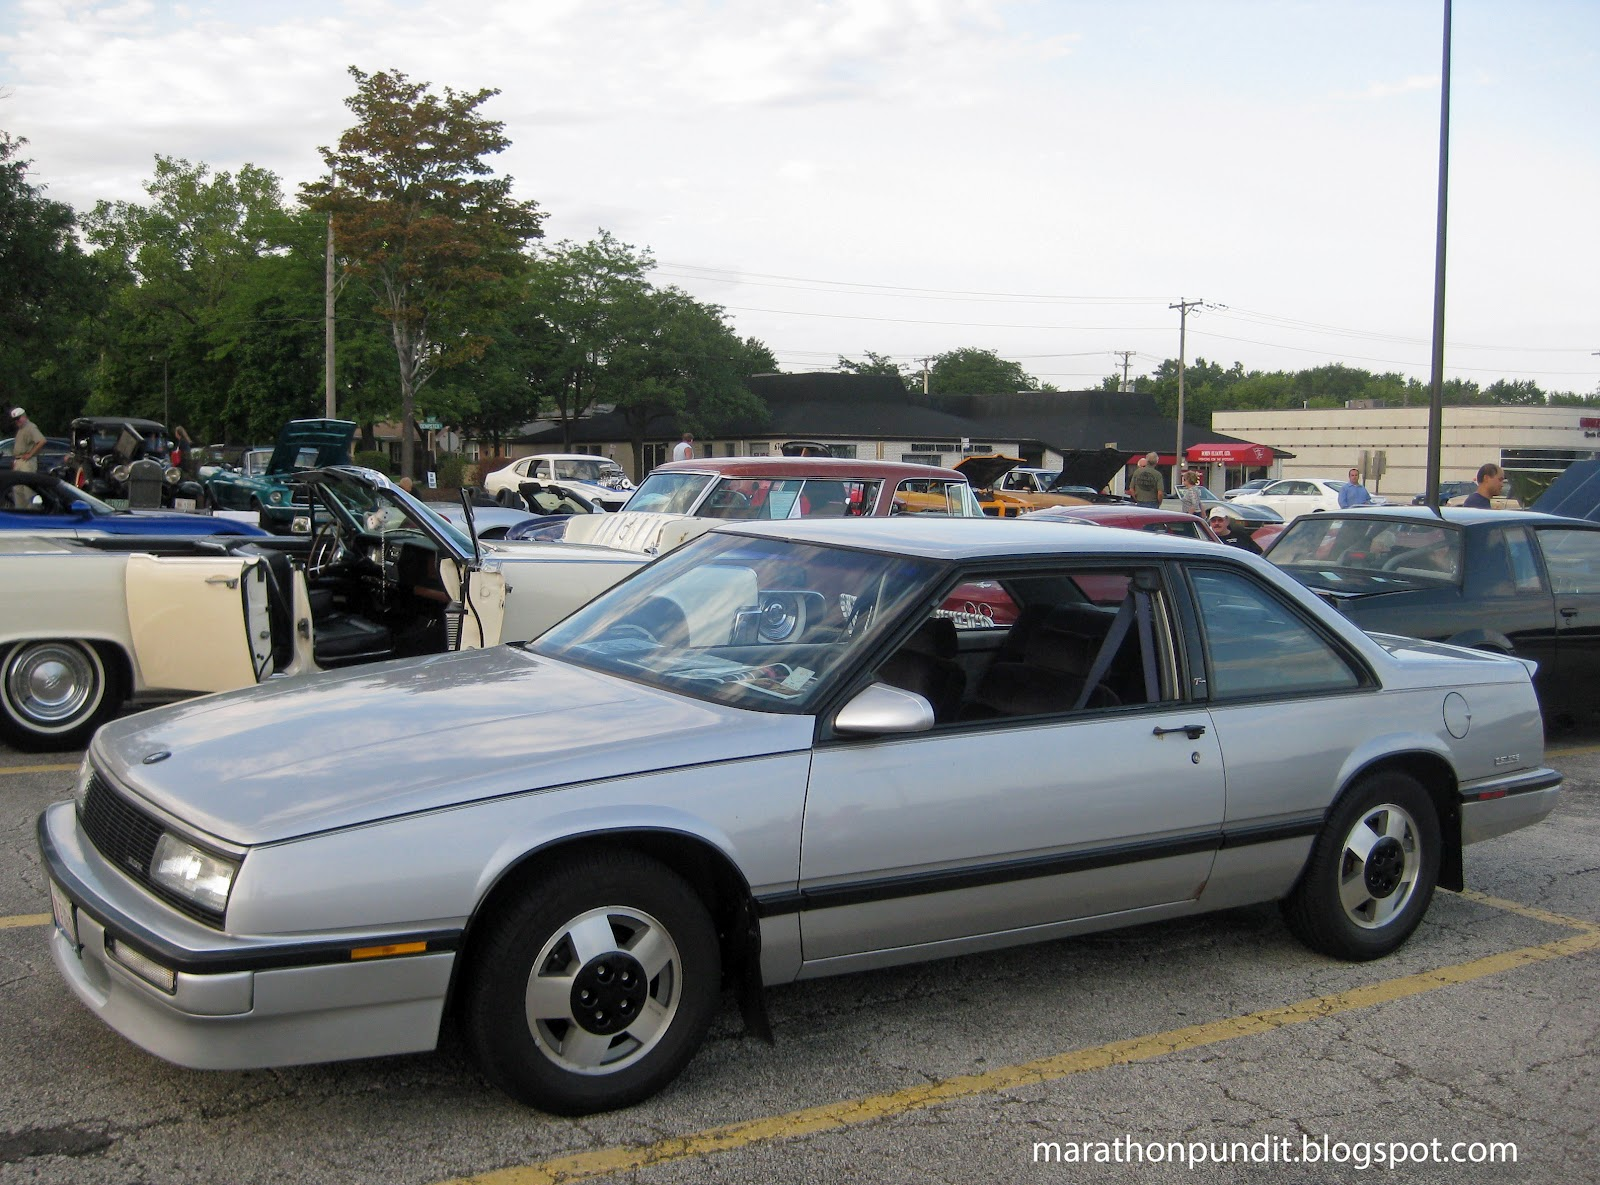 1988 Buick Lesabre T Type >> Marathon Pundit: (Photos) Morton Grove Classic Car Show 7/27/12